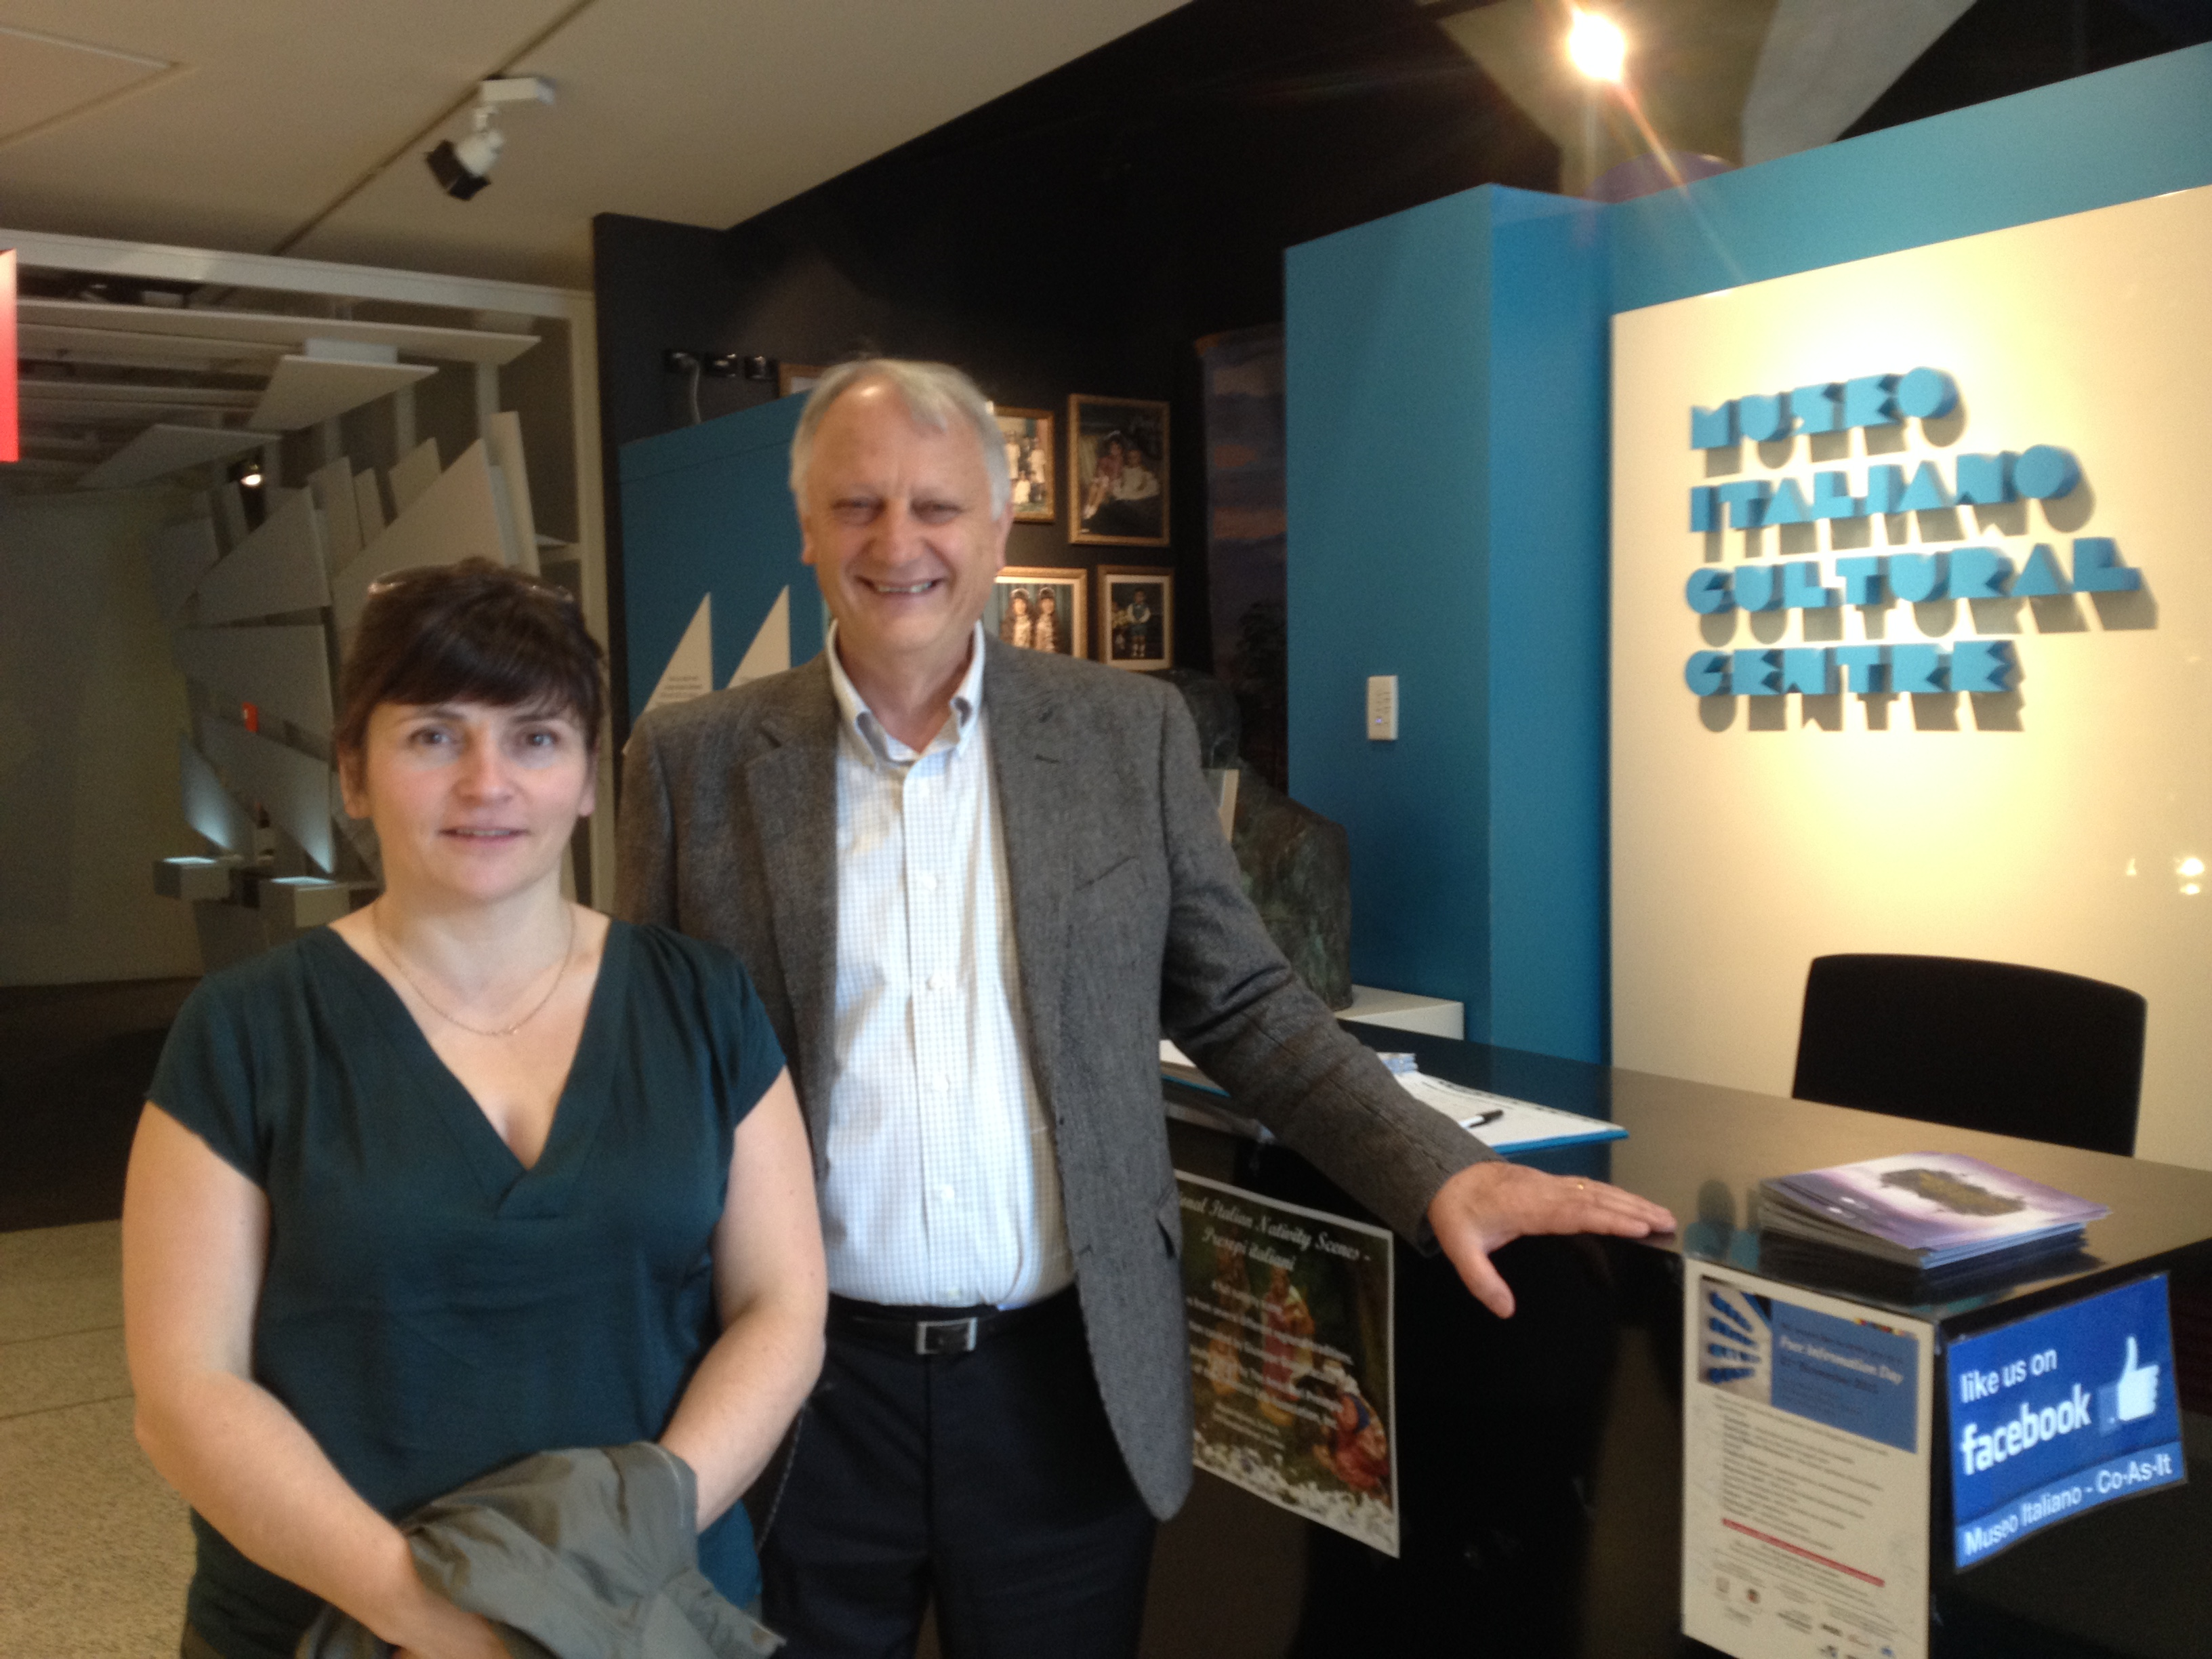 Director Ferdinando Colarossi and Deirdre Mackenna at the Museo Italiano, Melbourne 11.12.2015 © Cultural Documents